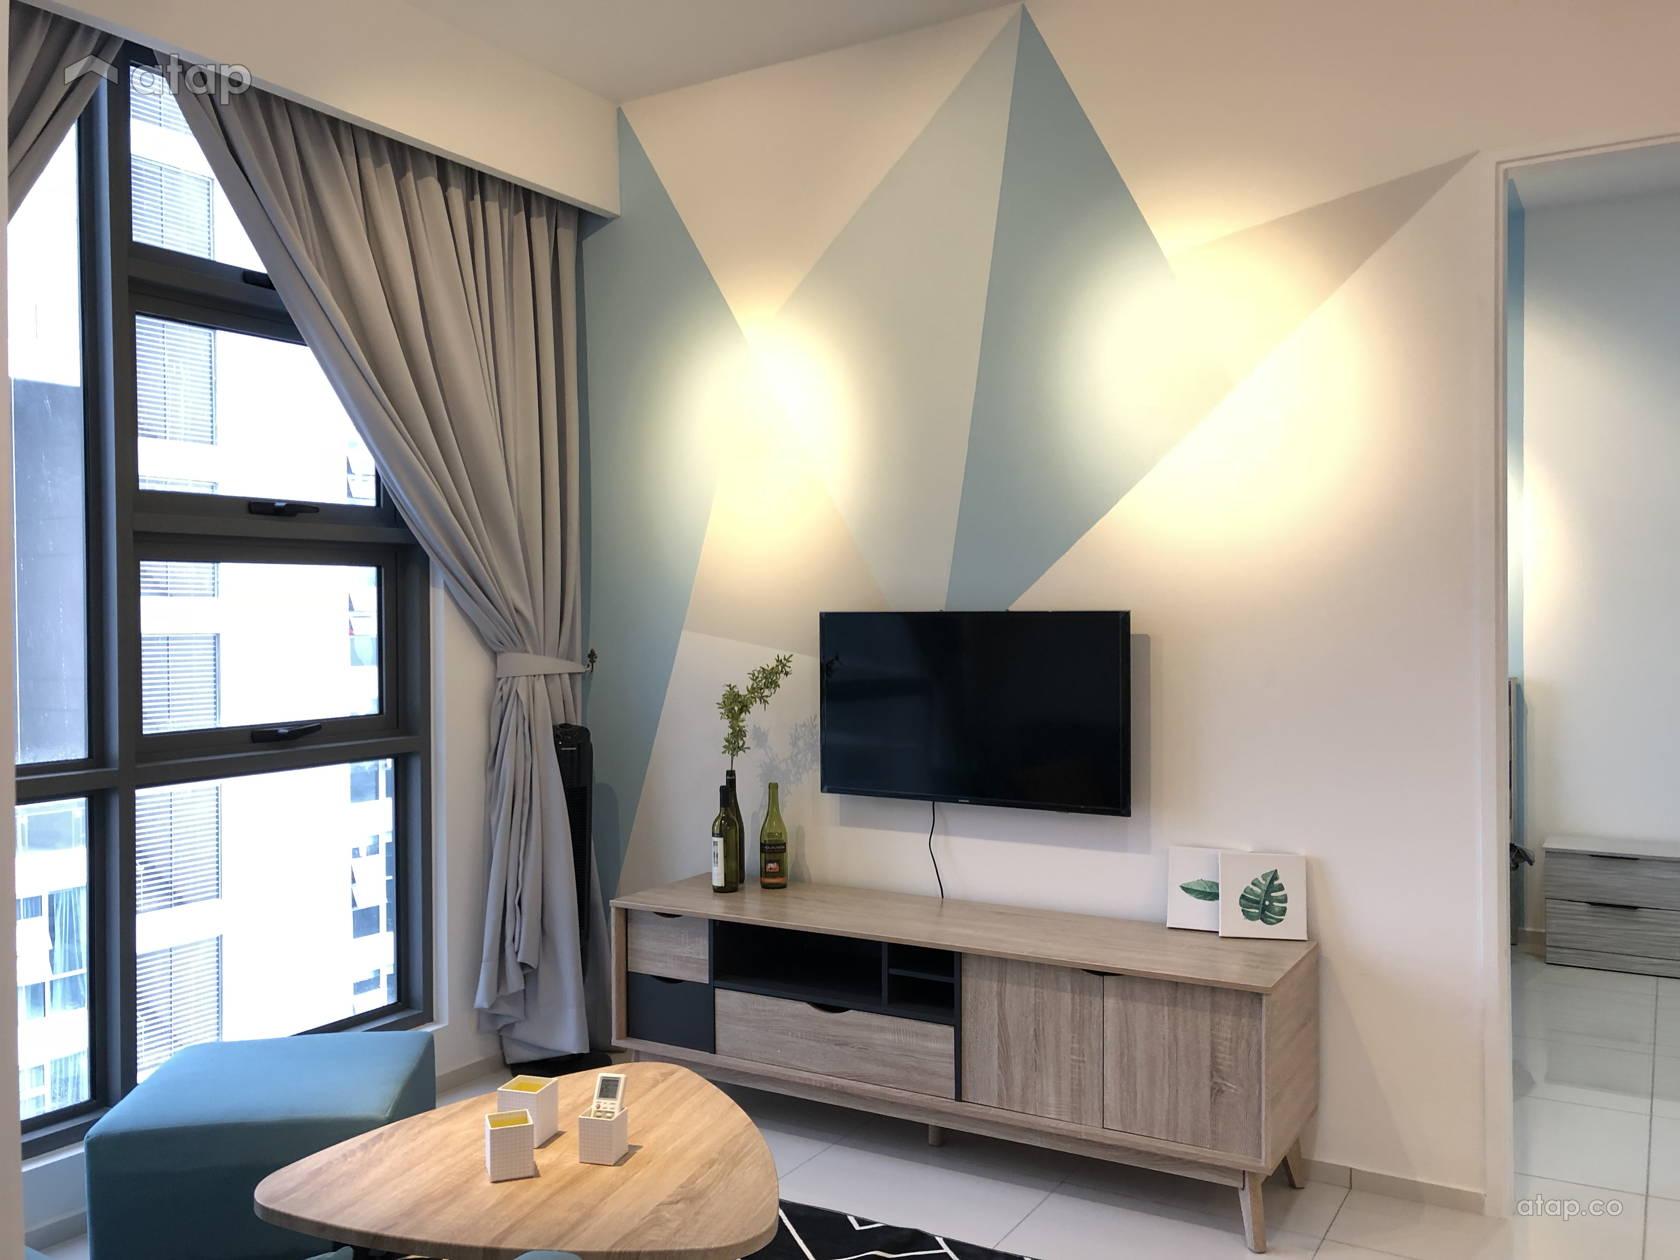 Harga Dan Spek Dr 5000 Hitam Update 2018 Loop Ekskul Steam Wallet 15 Robertson Residence In Bukit Bintang Wp Kuala Lumpur Pac Living Concept